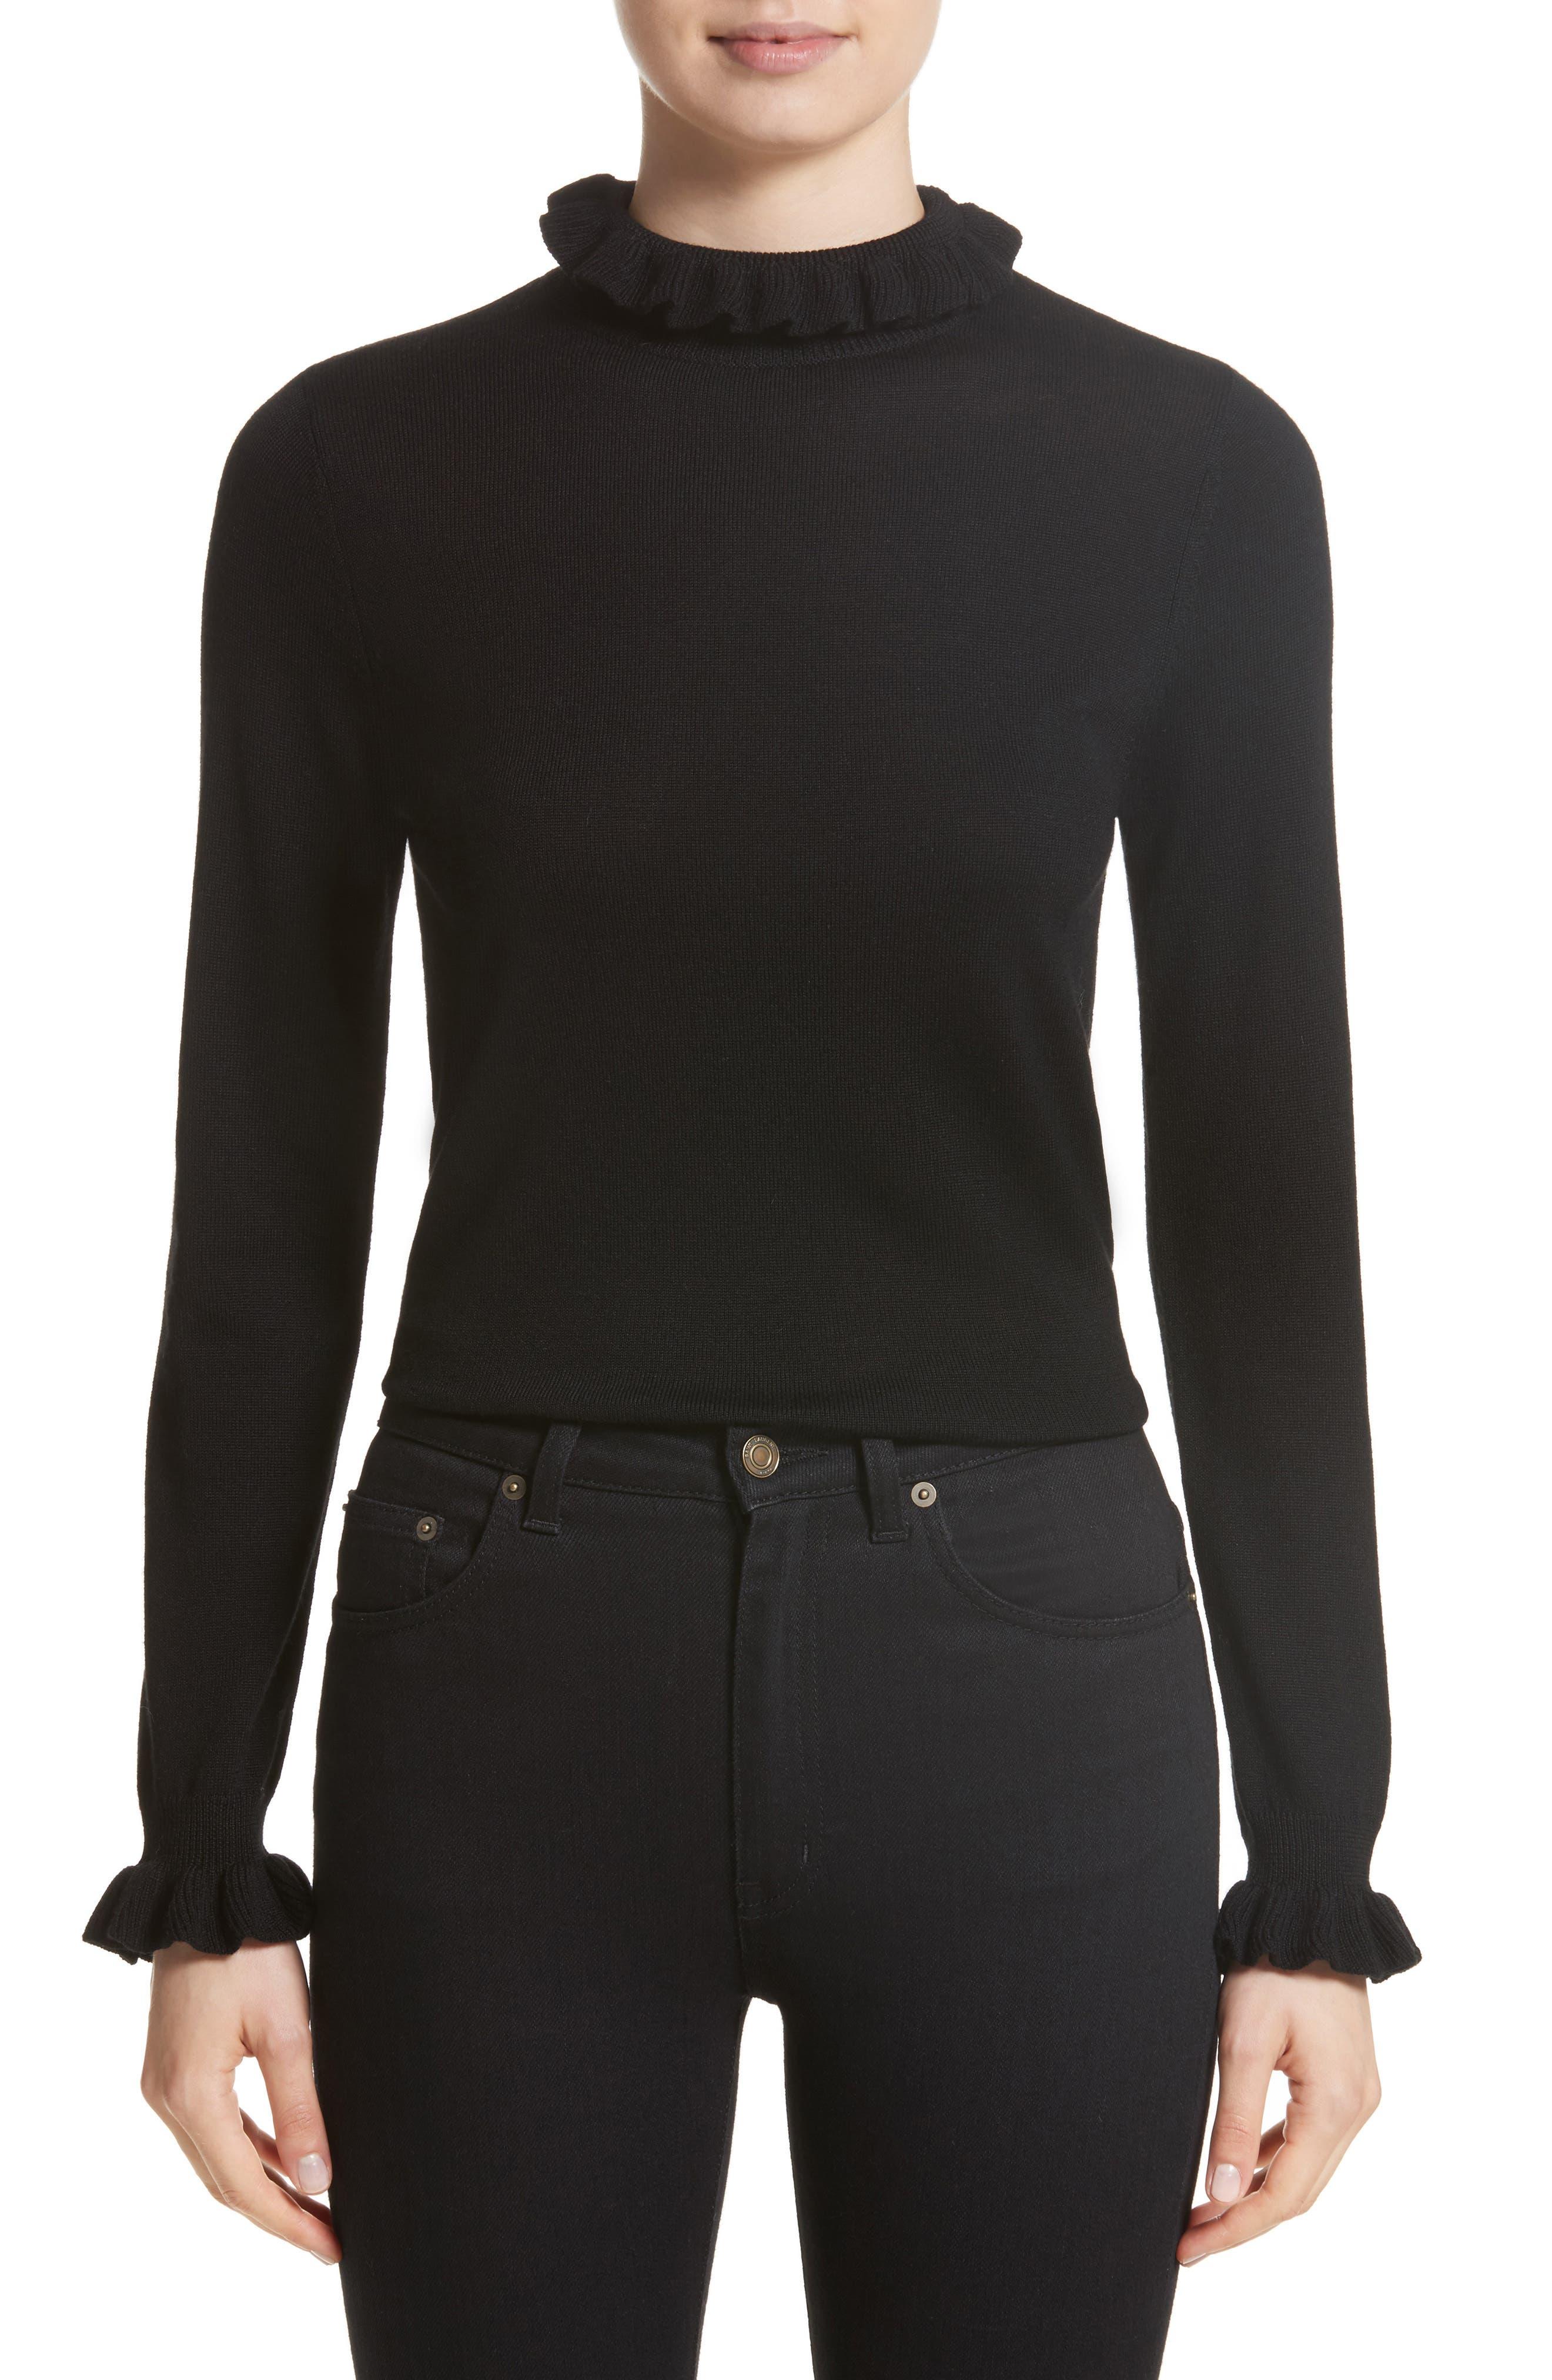 Robin Frill Wool Sweater,                             Main thumbnail 1, color,                             Black